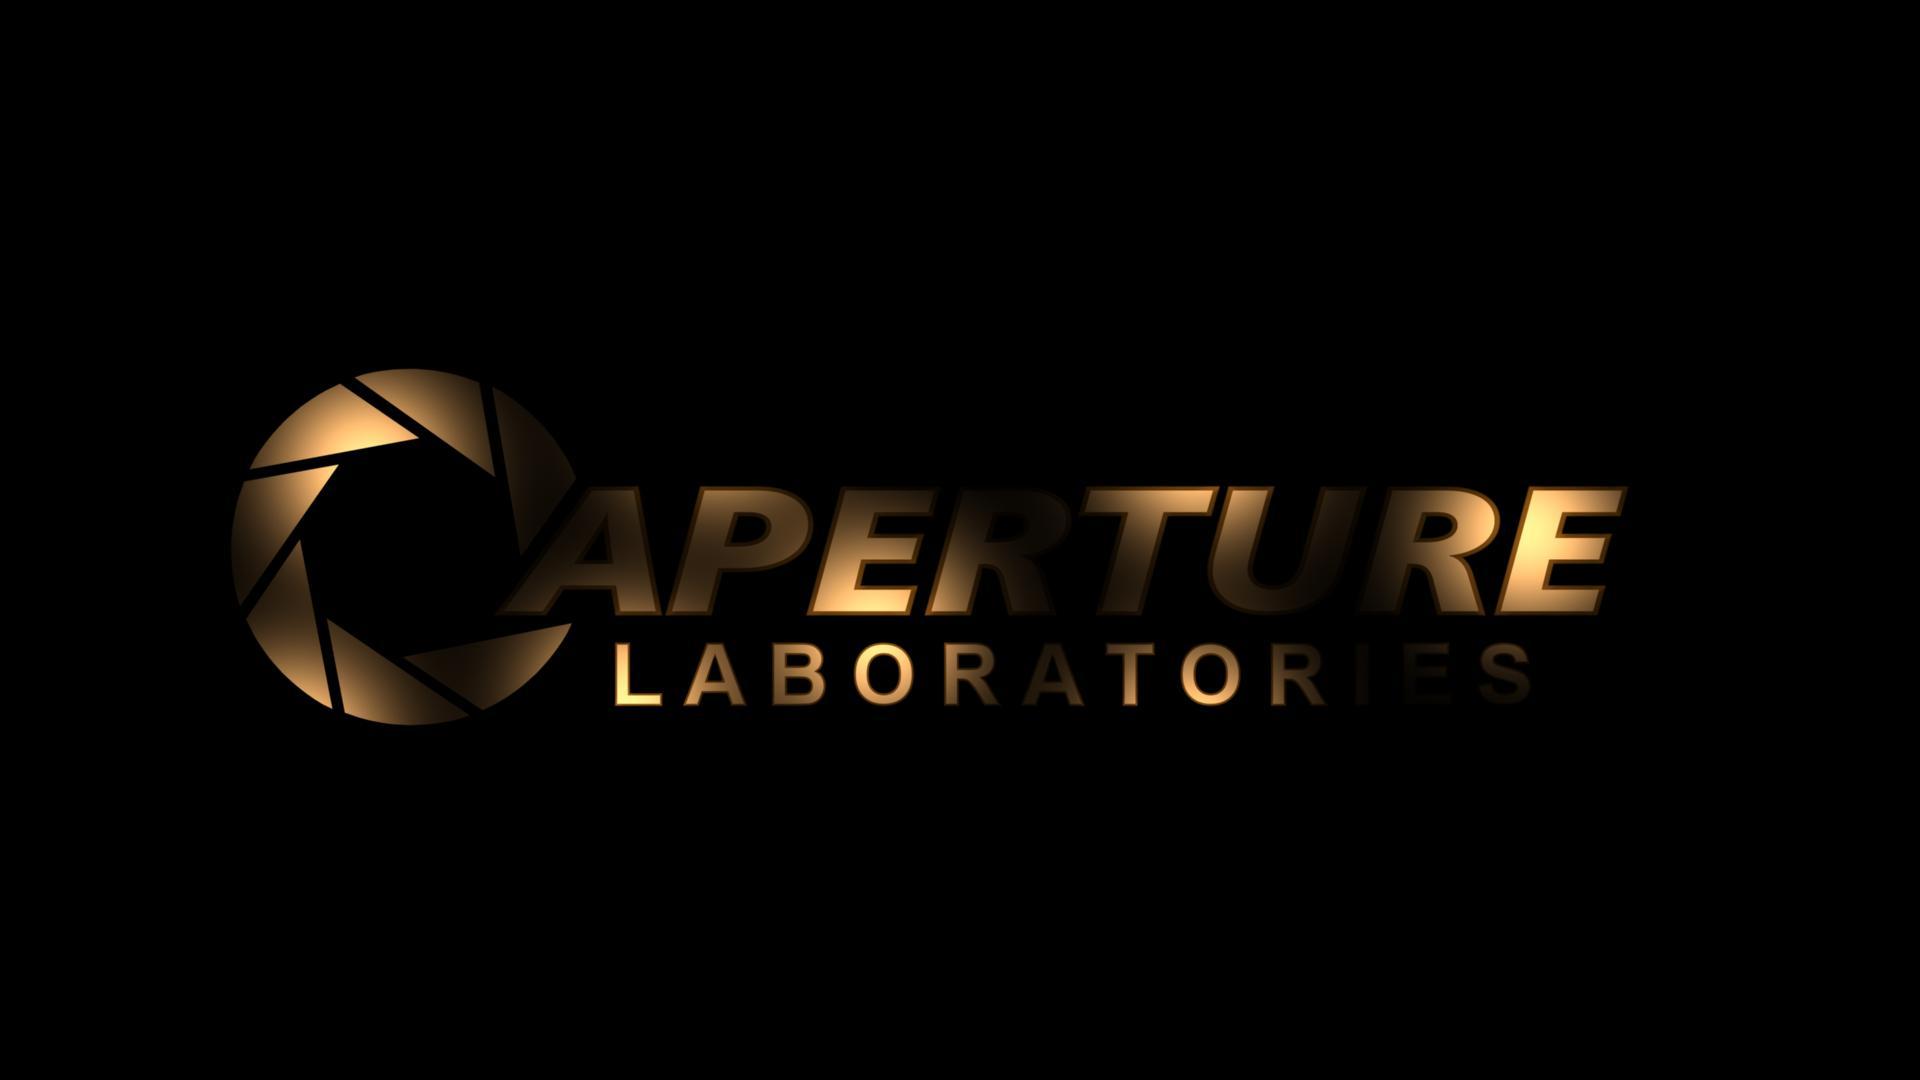 Aperture Science Wallpaper 3 by striker109 on DeviantArt